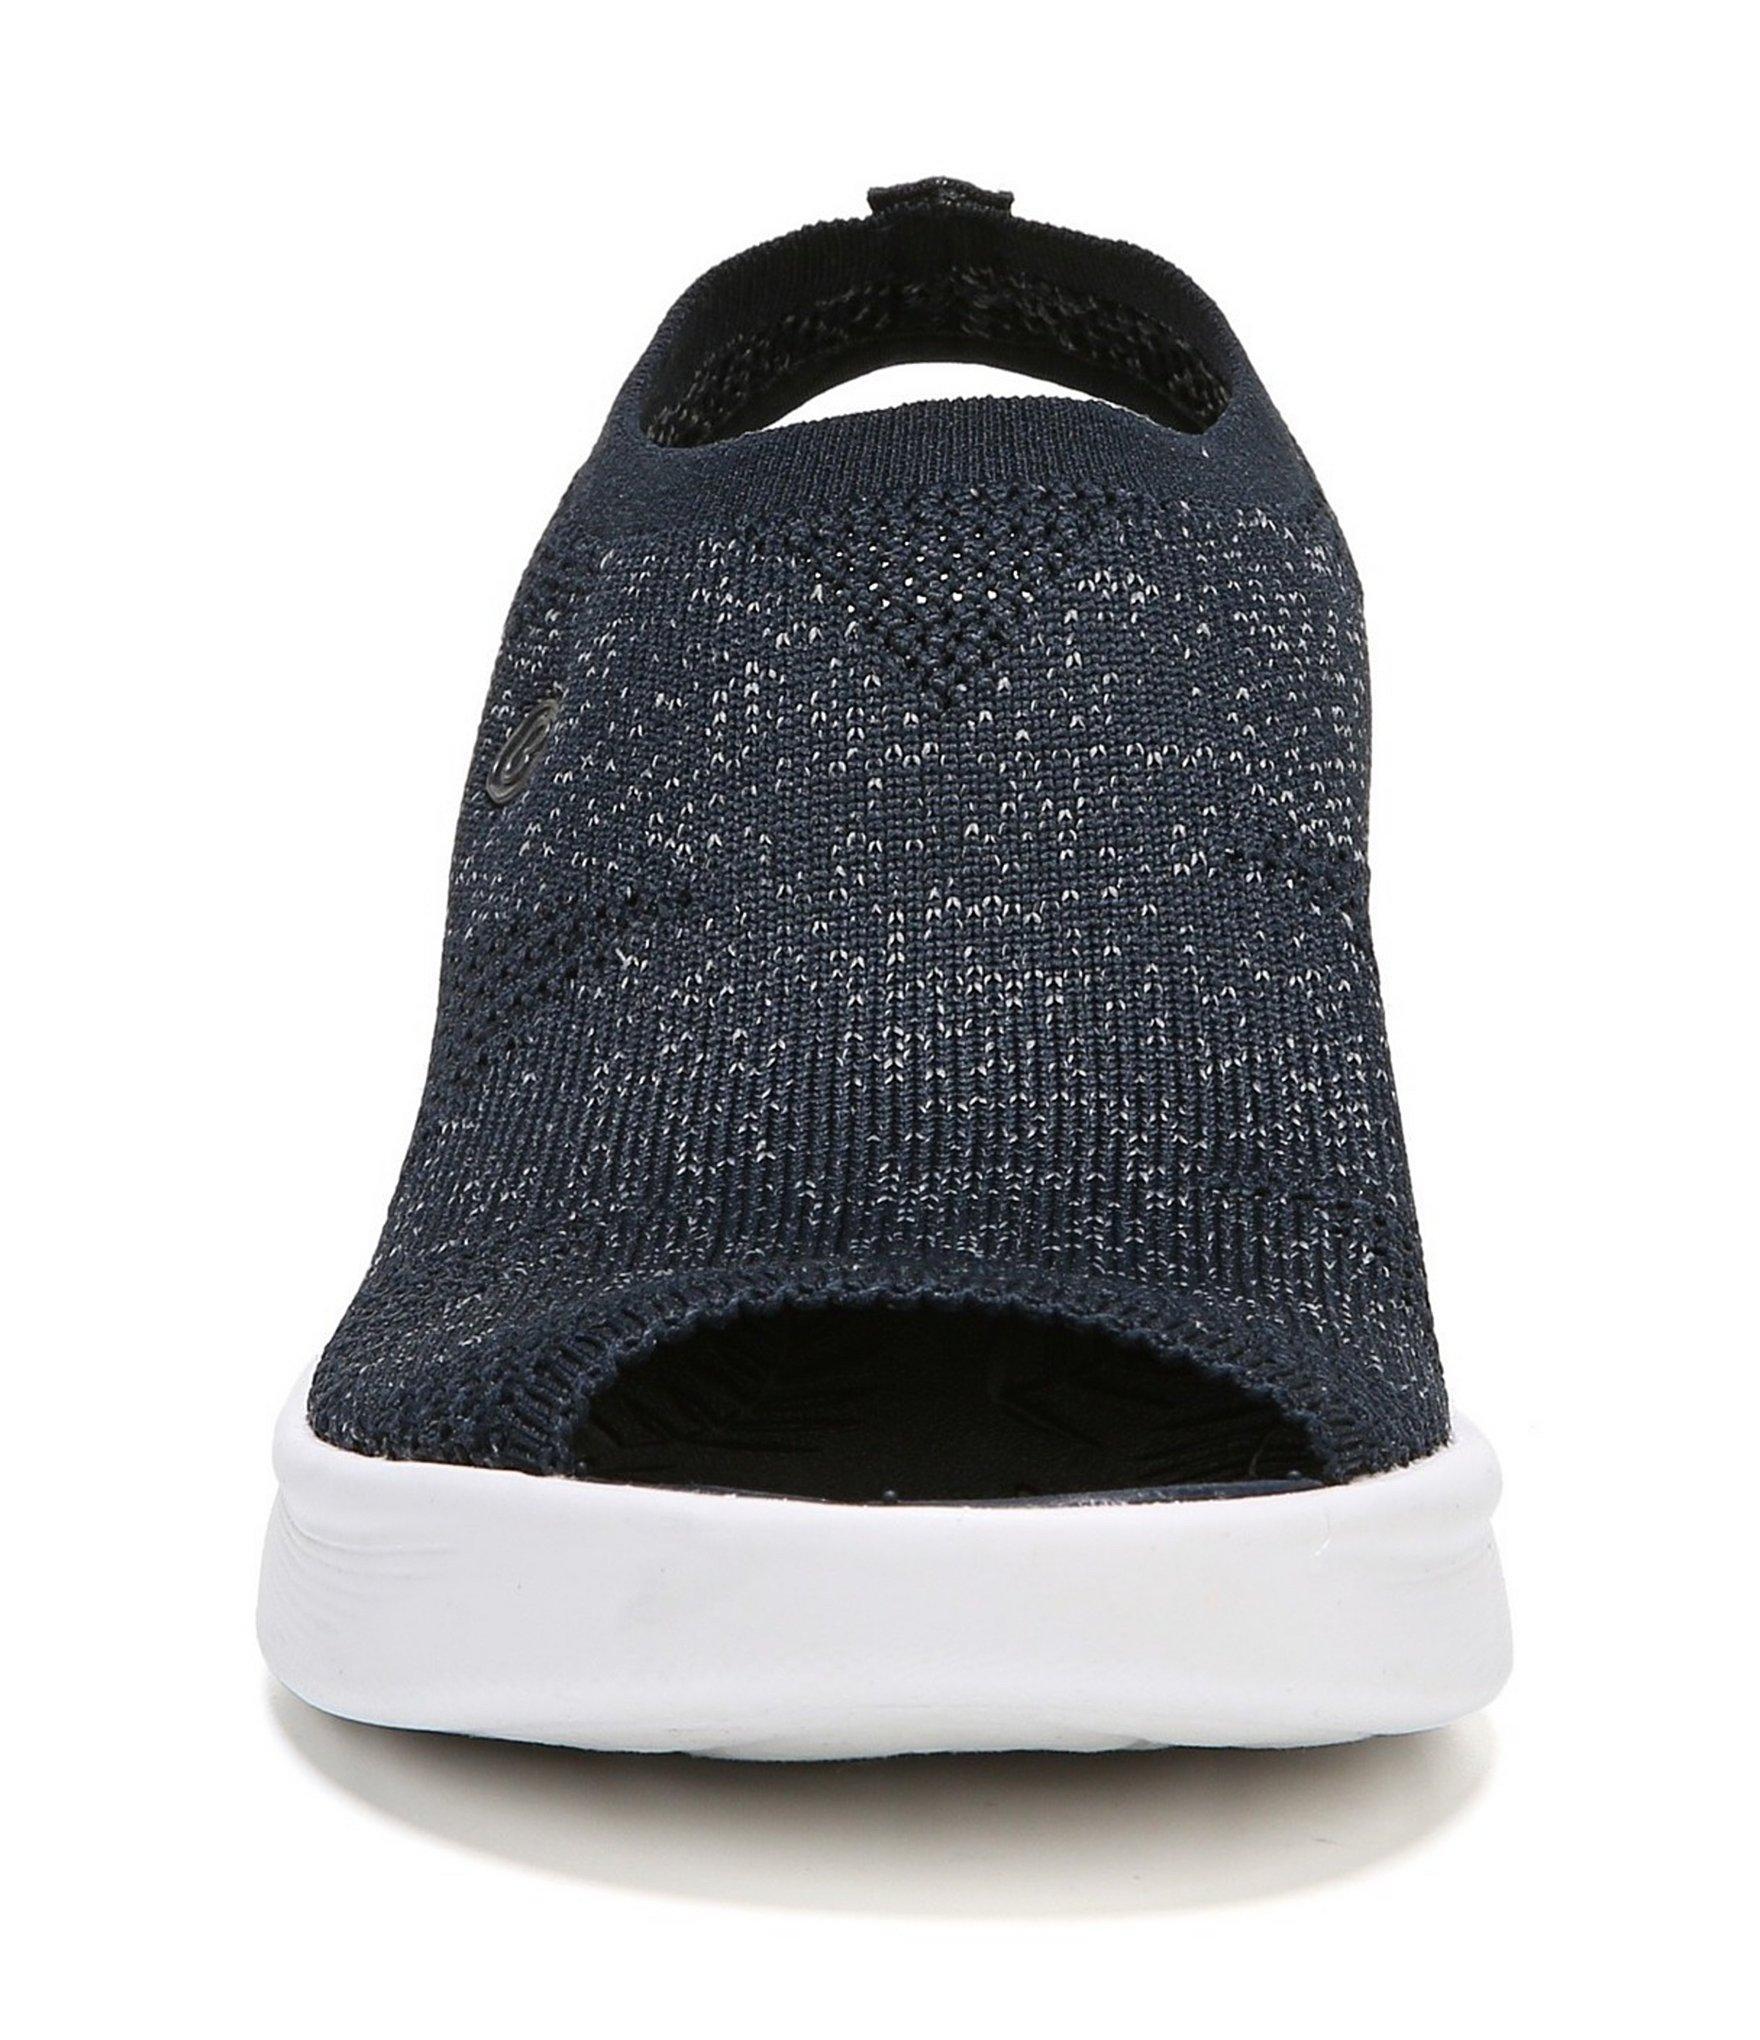 abfdc19c129a Lyst - Bzees Secret Peep-toe Fabric Sandals in Blue